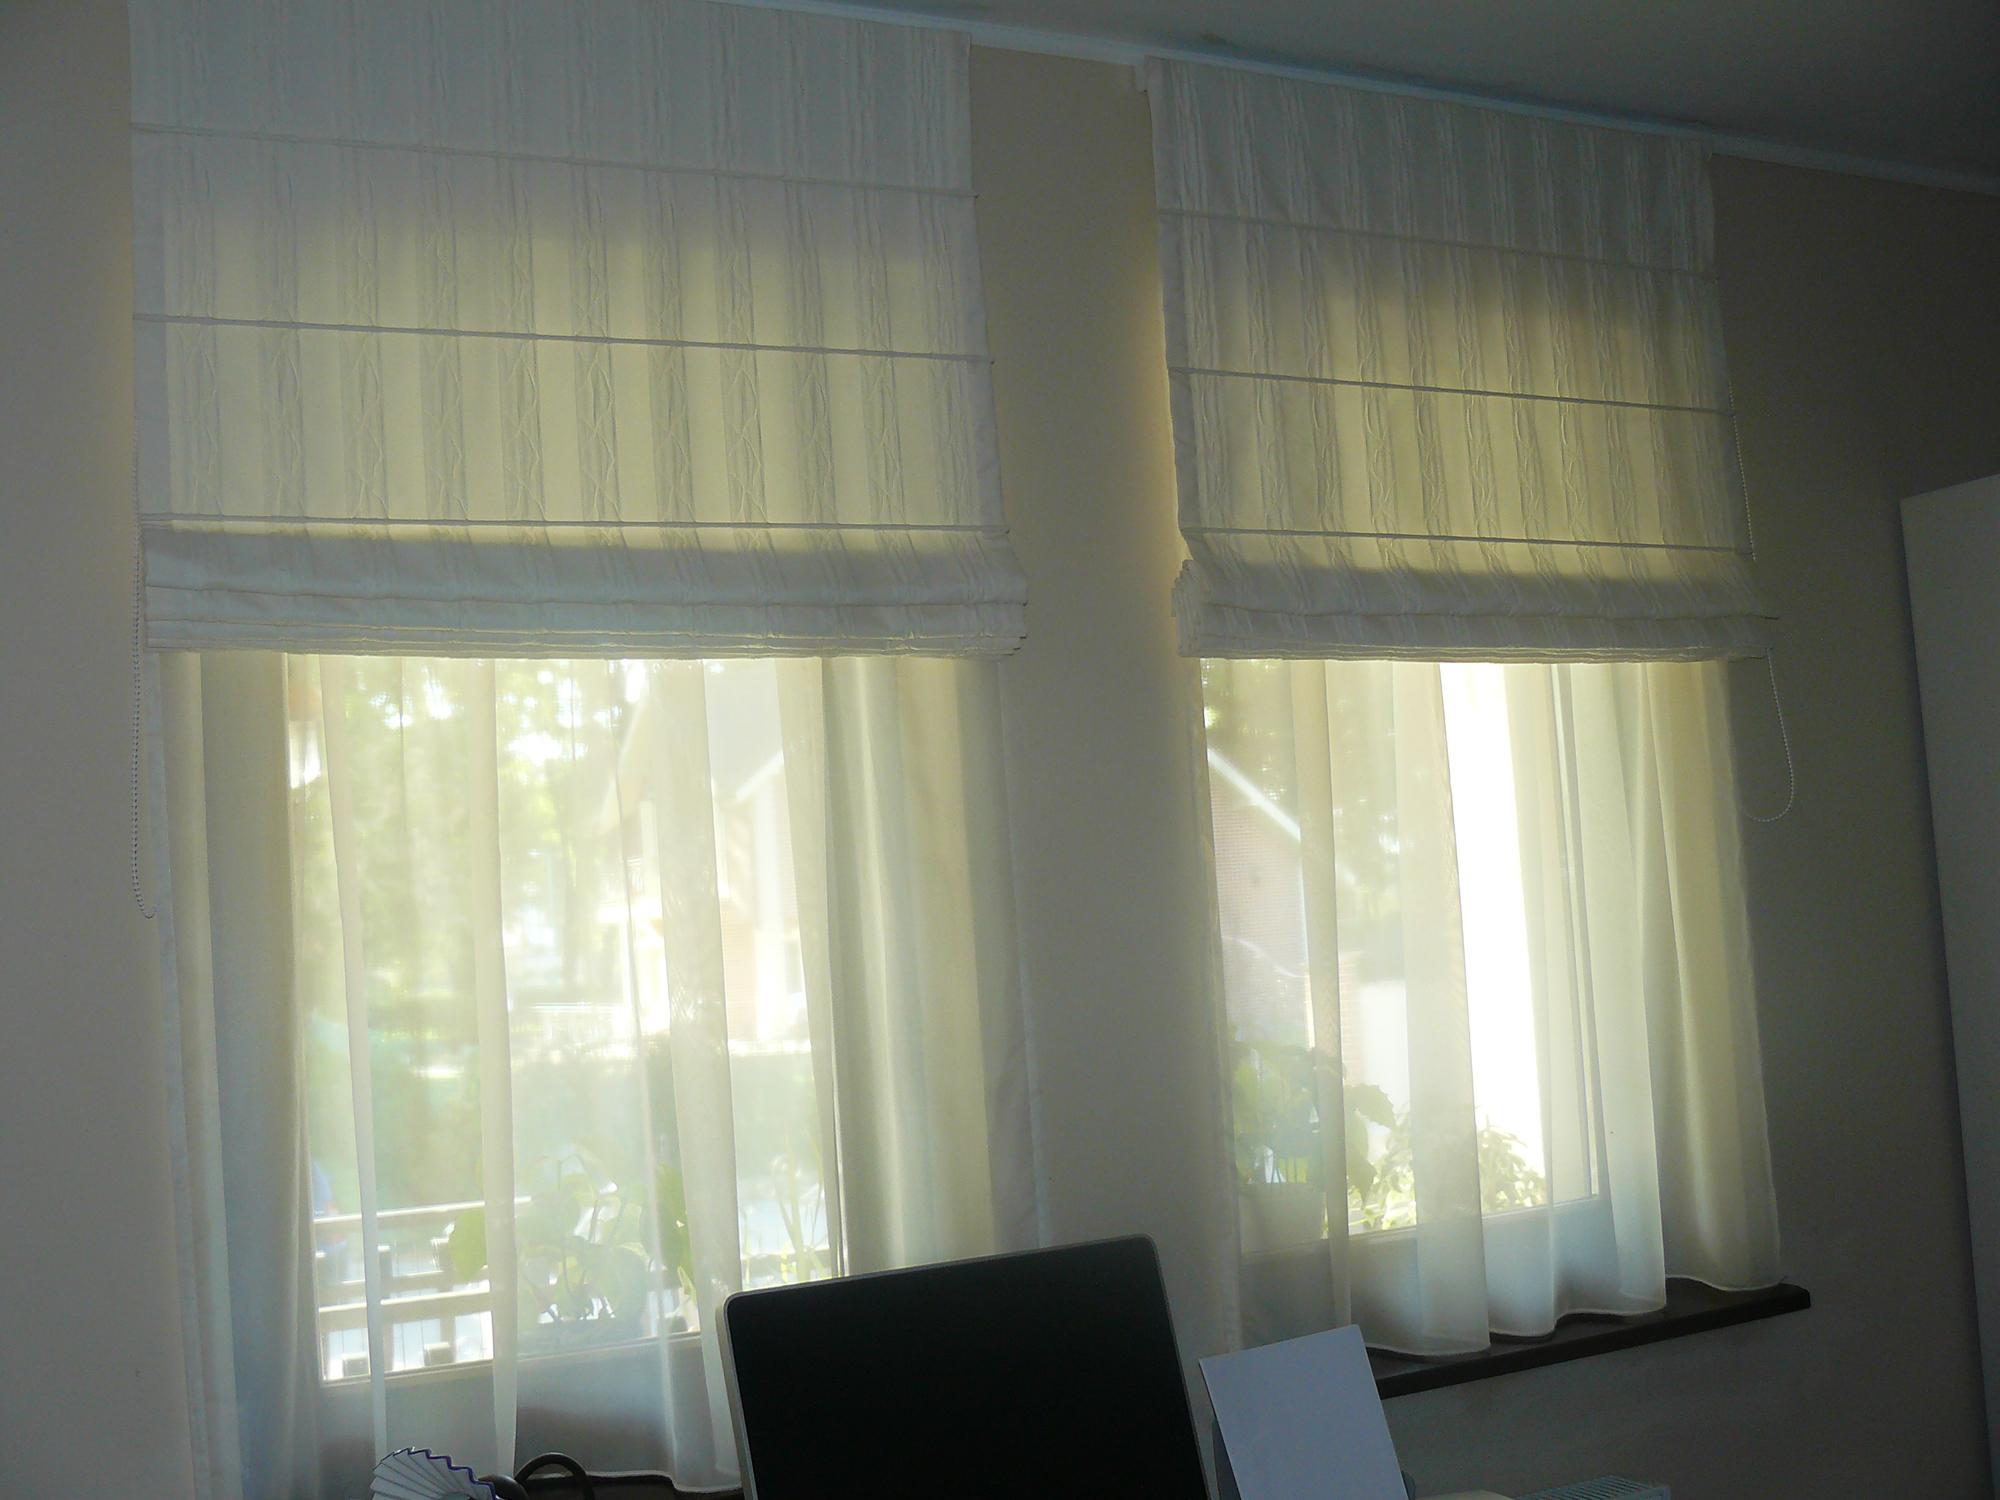 Perdele si draperii din materiale textile VRIESCO - Poza 3